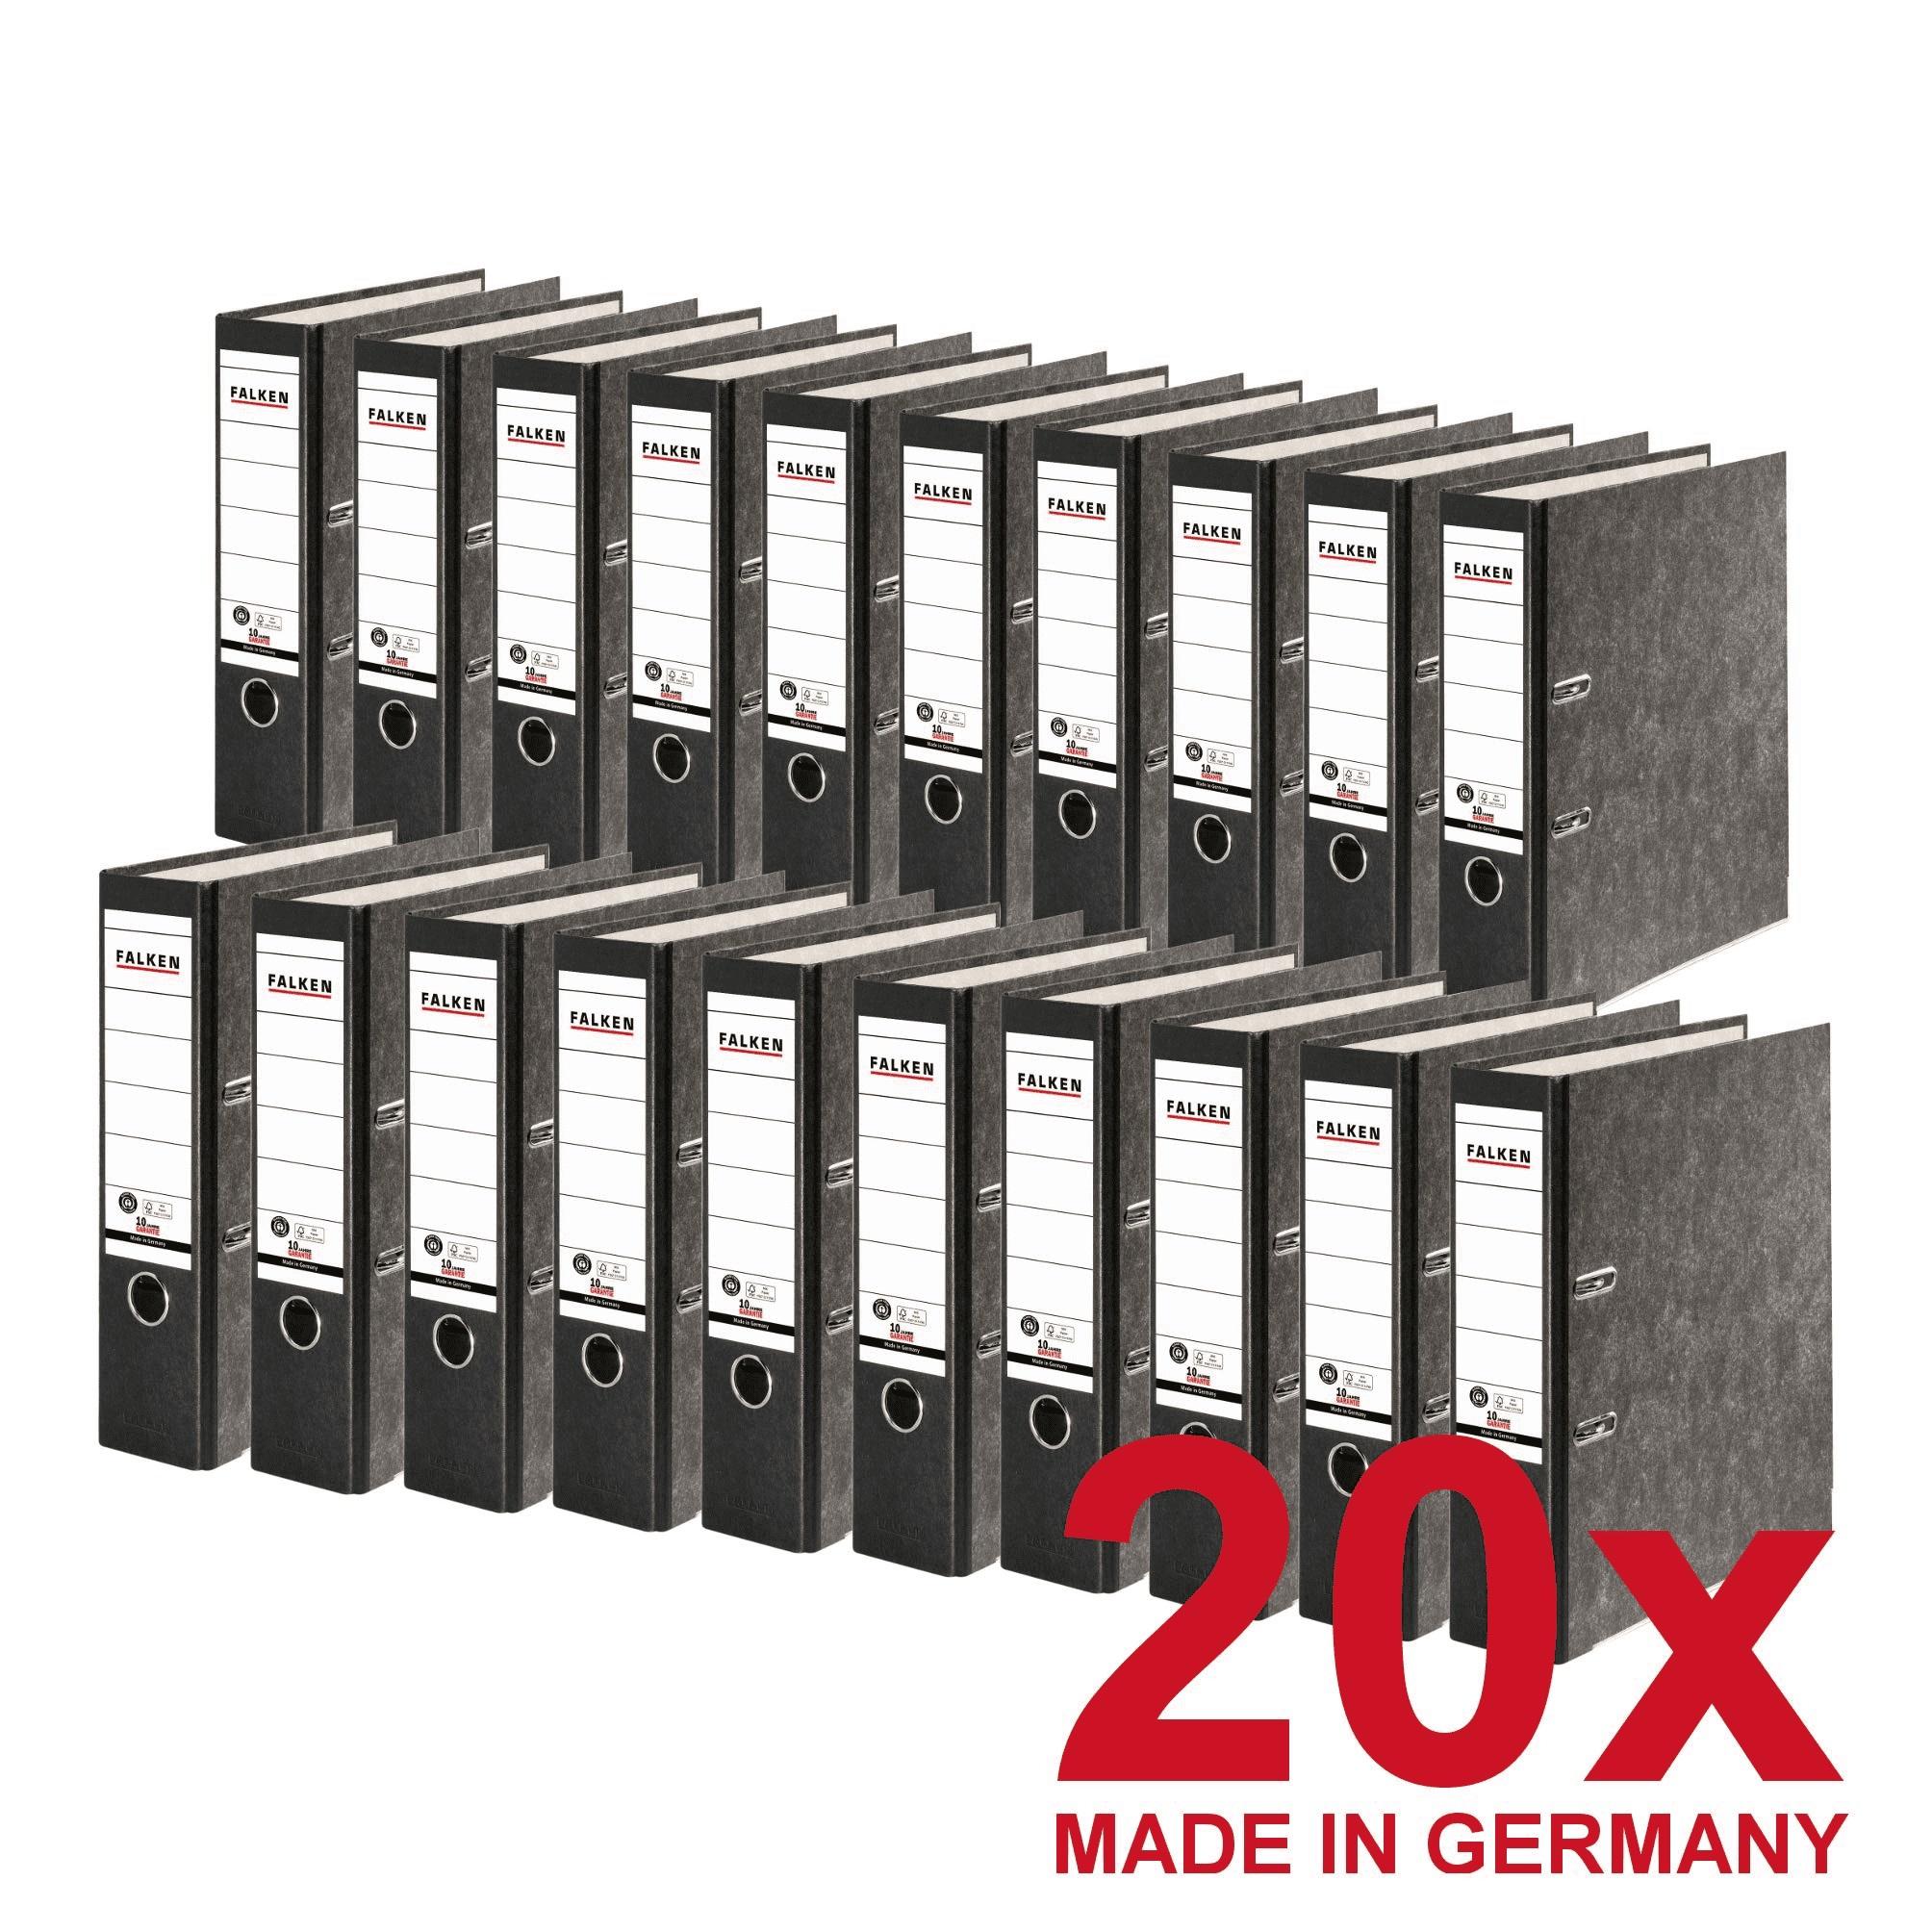 20x FALKEN Recycling Ordner DIN-A4, 8cm Wolkenmarmor schwarzer Rücken Ringordner Aktenordner Briefor